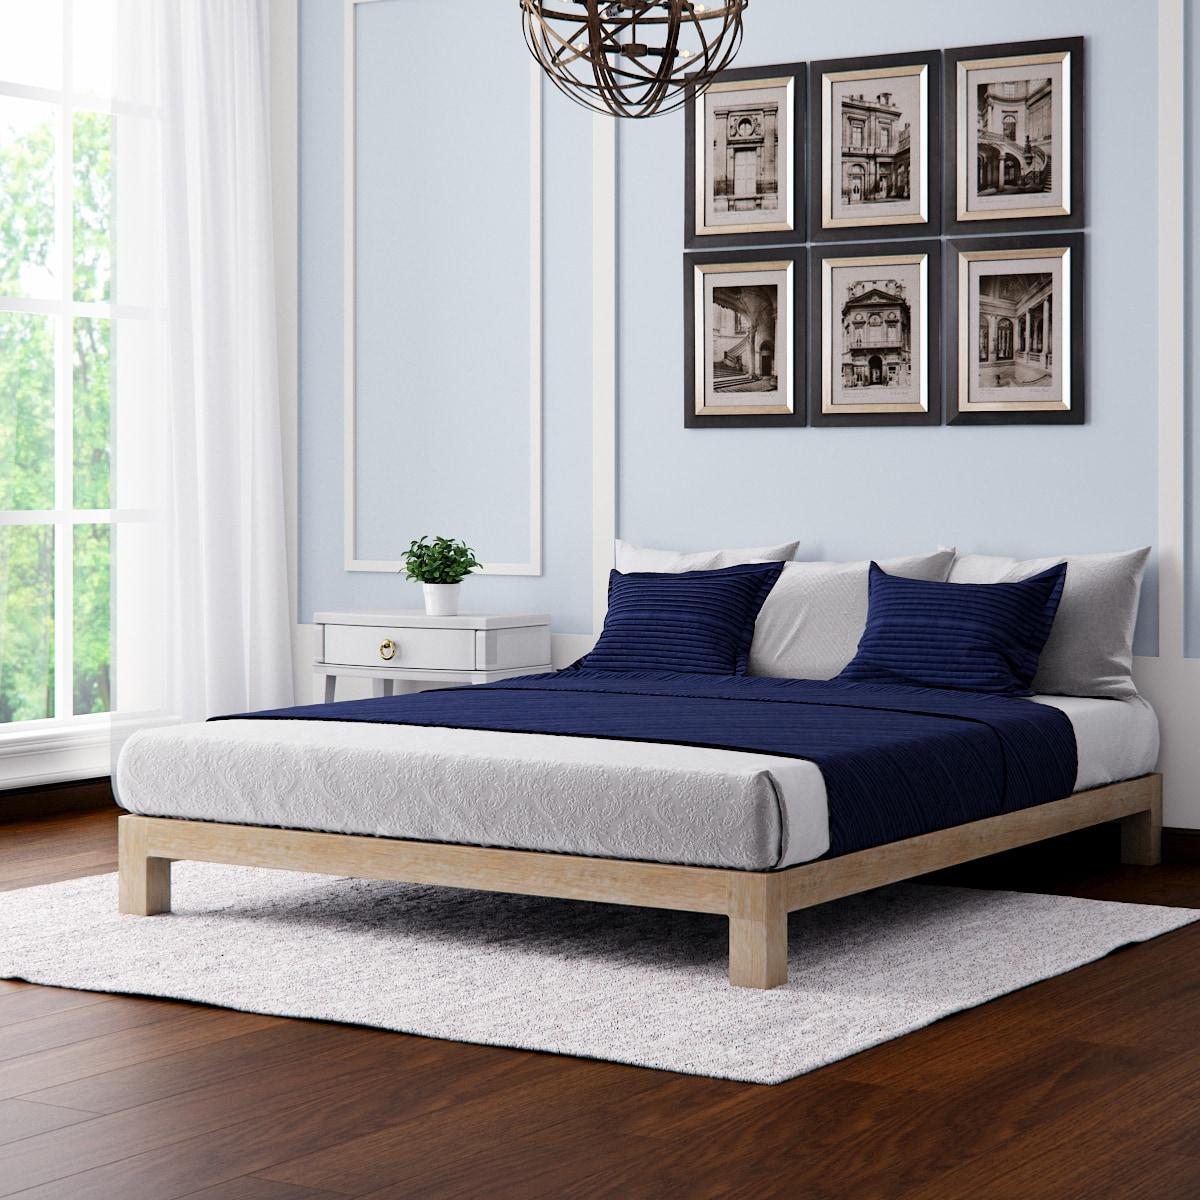 Motif Design Aura Deluxe Platform Bed - Gold